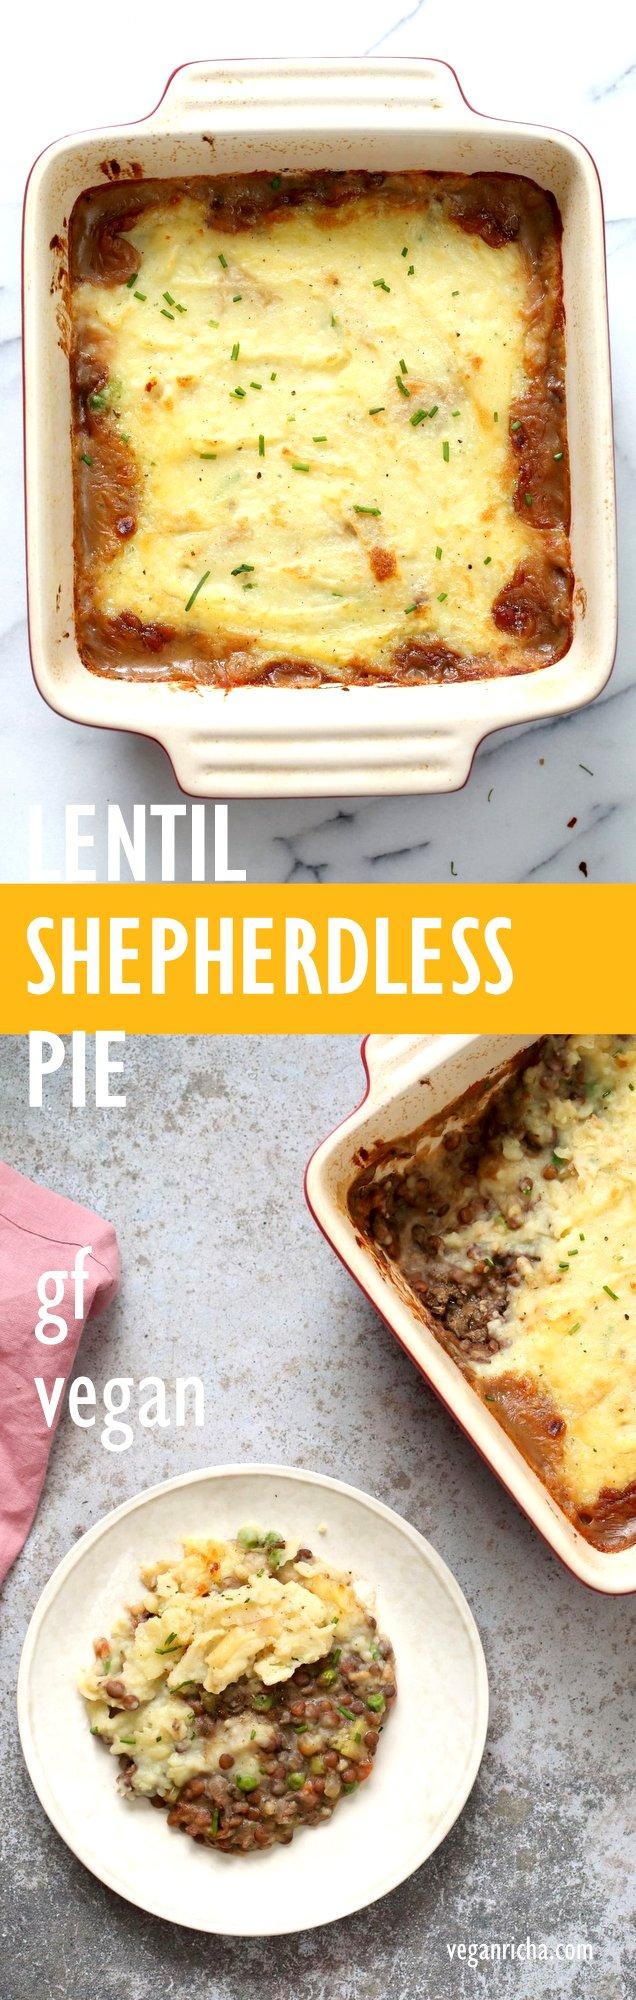 Vegan Shepherd's Pie - Mushroom and Lentil Shepherdless Pie with Gravy and Garlic mashed potatoes. #Vegan #Glutenfree #Recipe. Can be soy-free. #veganricha | VeganRicha.com